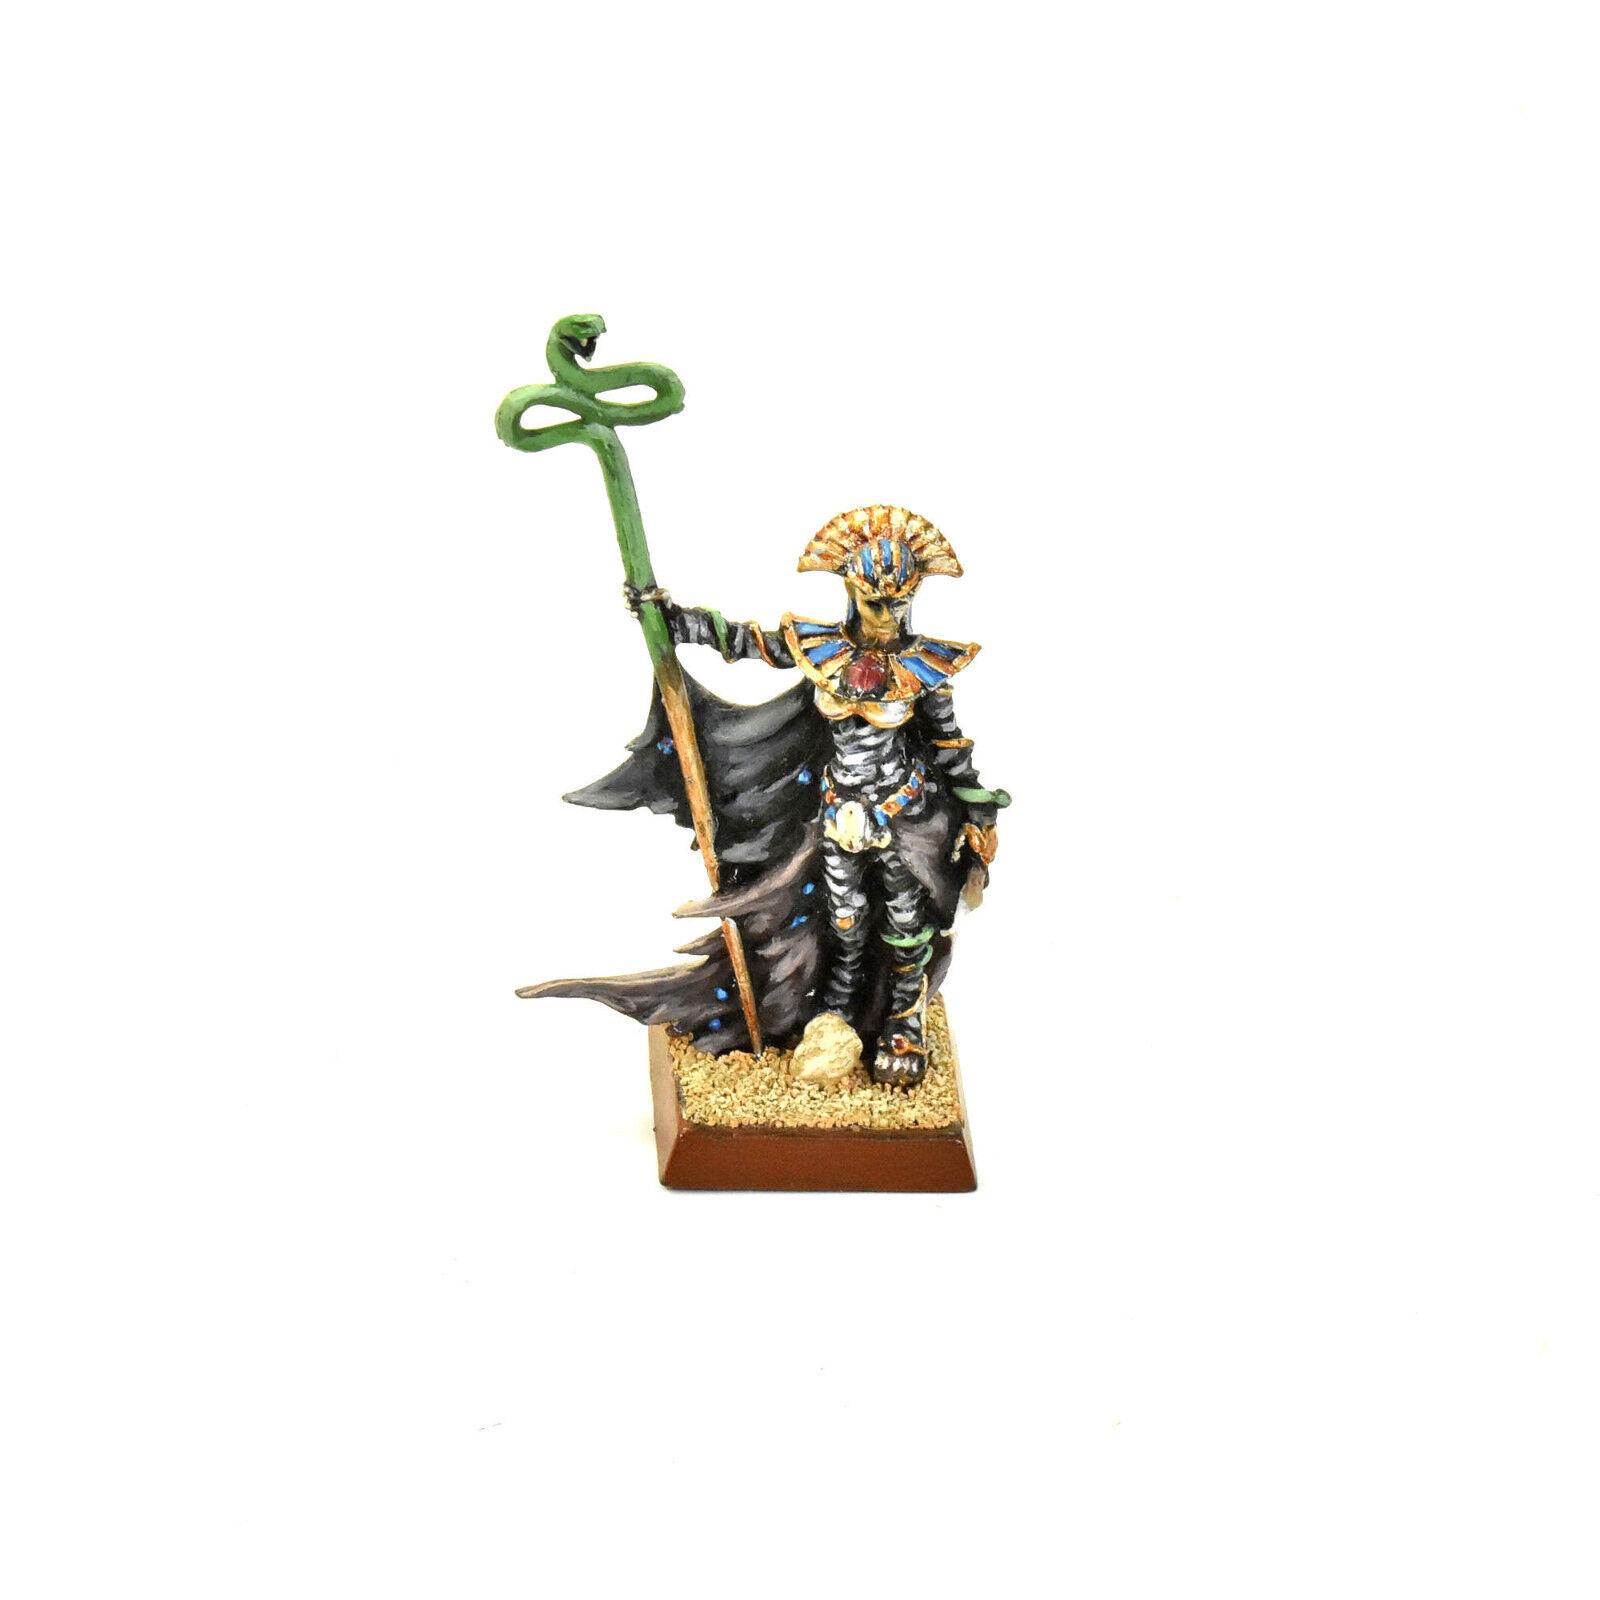 Tumba de Reyes alta REINA KHALIDA Pro pintado warhammer fantasy